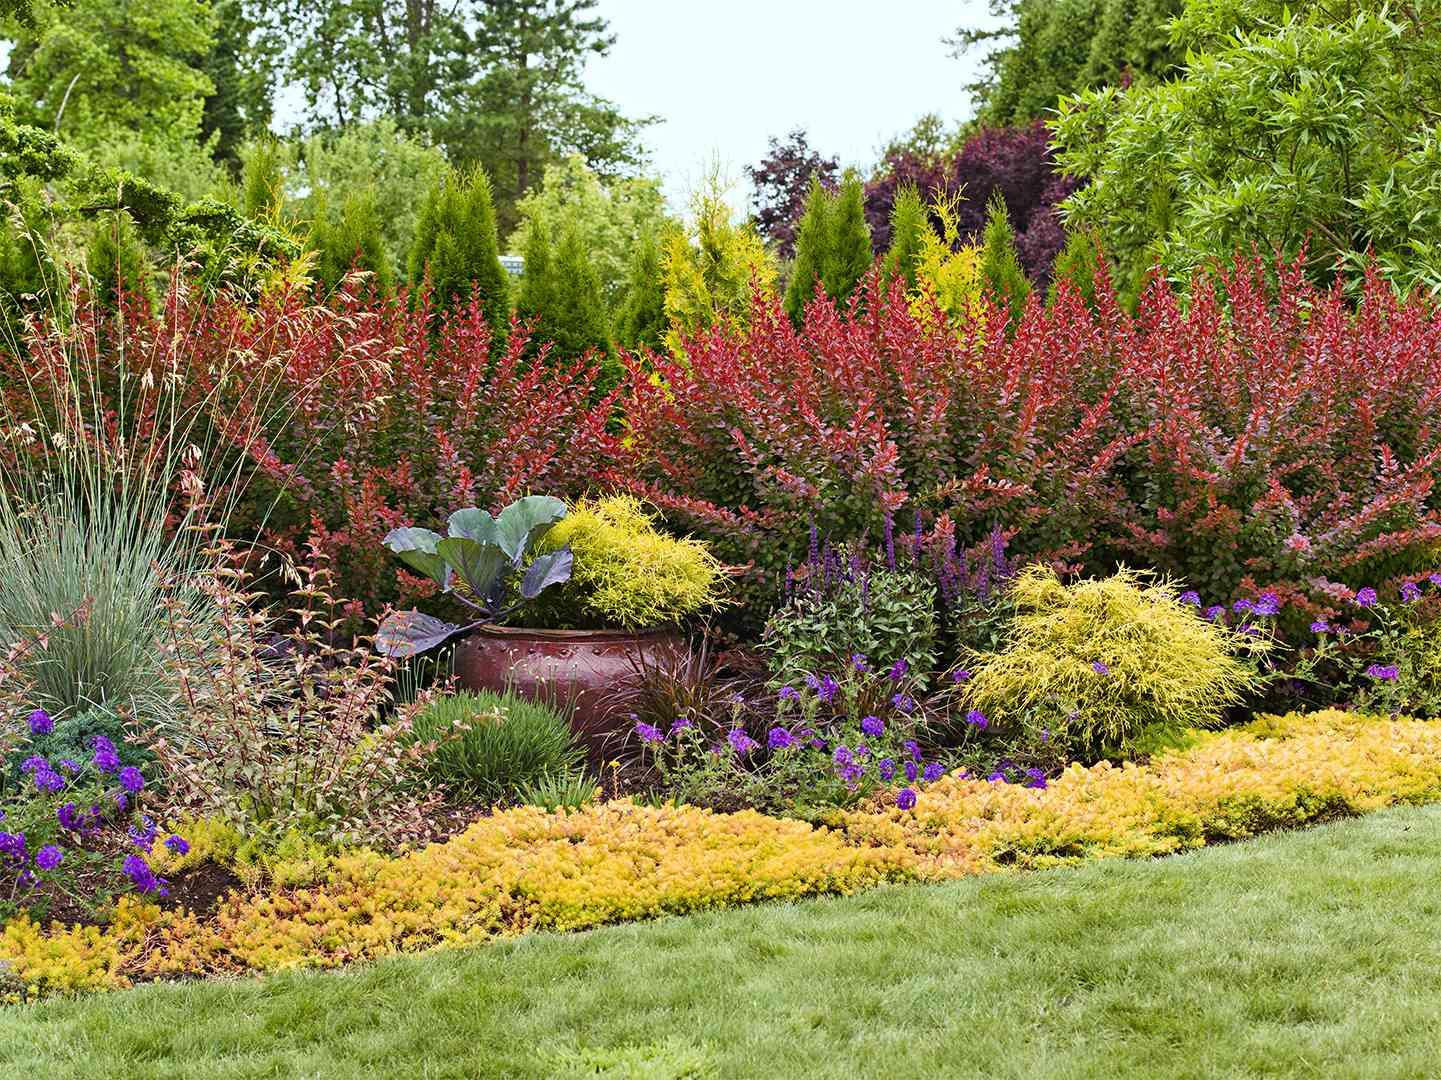 Easy Landscaping Ideas | Better Homes & Gardens on Easy Back Garden Ideas id=51421